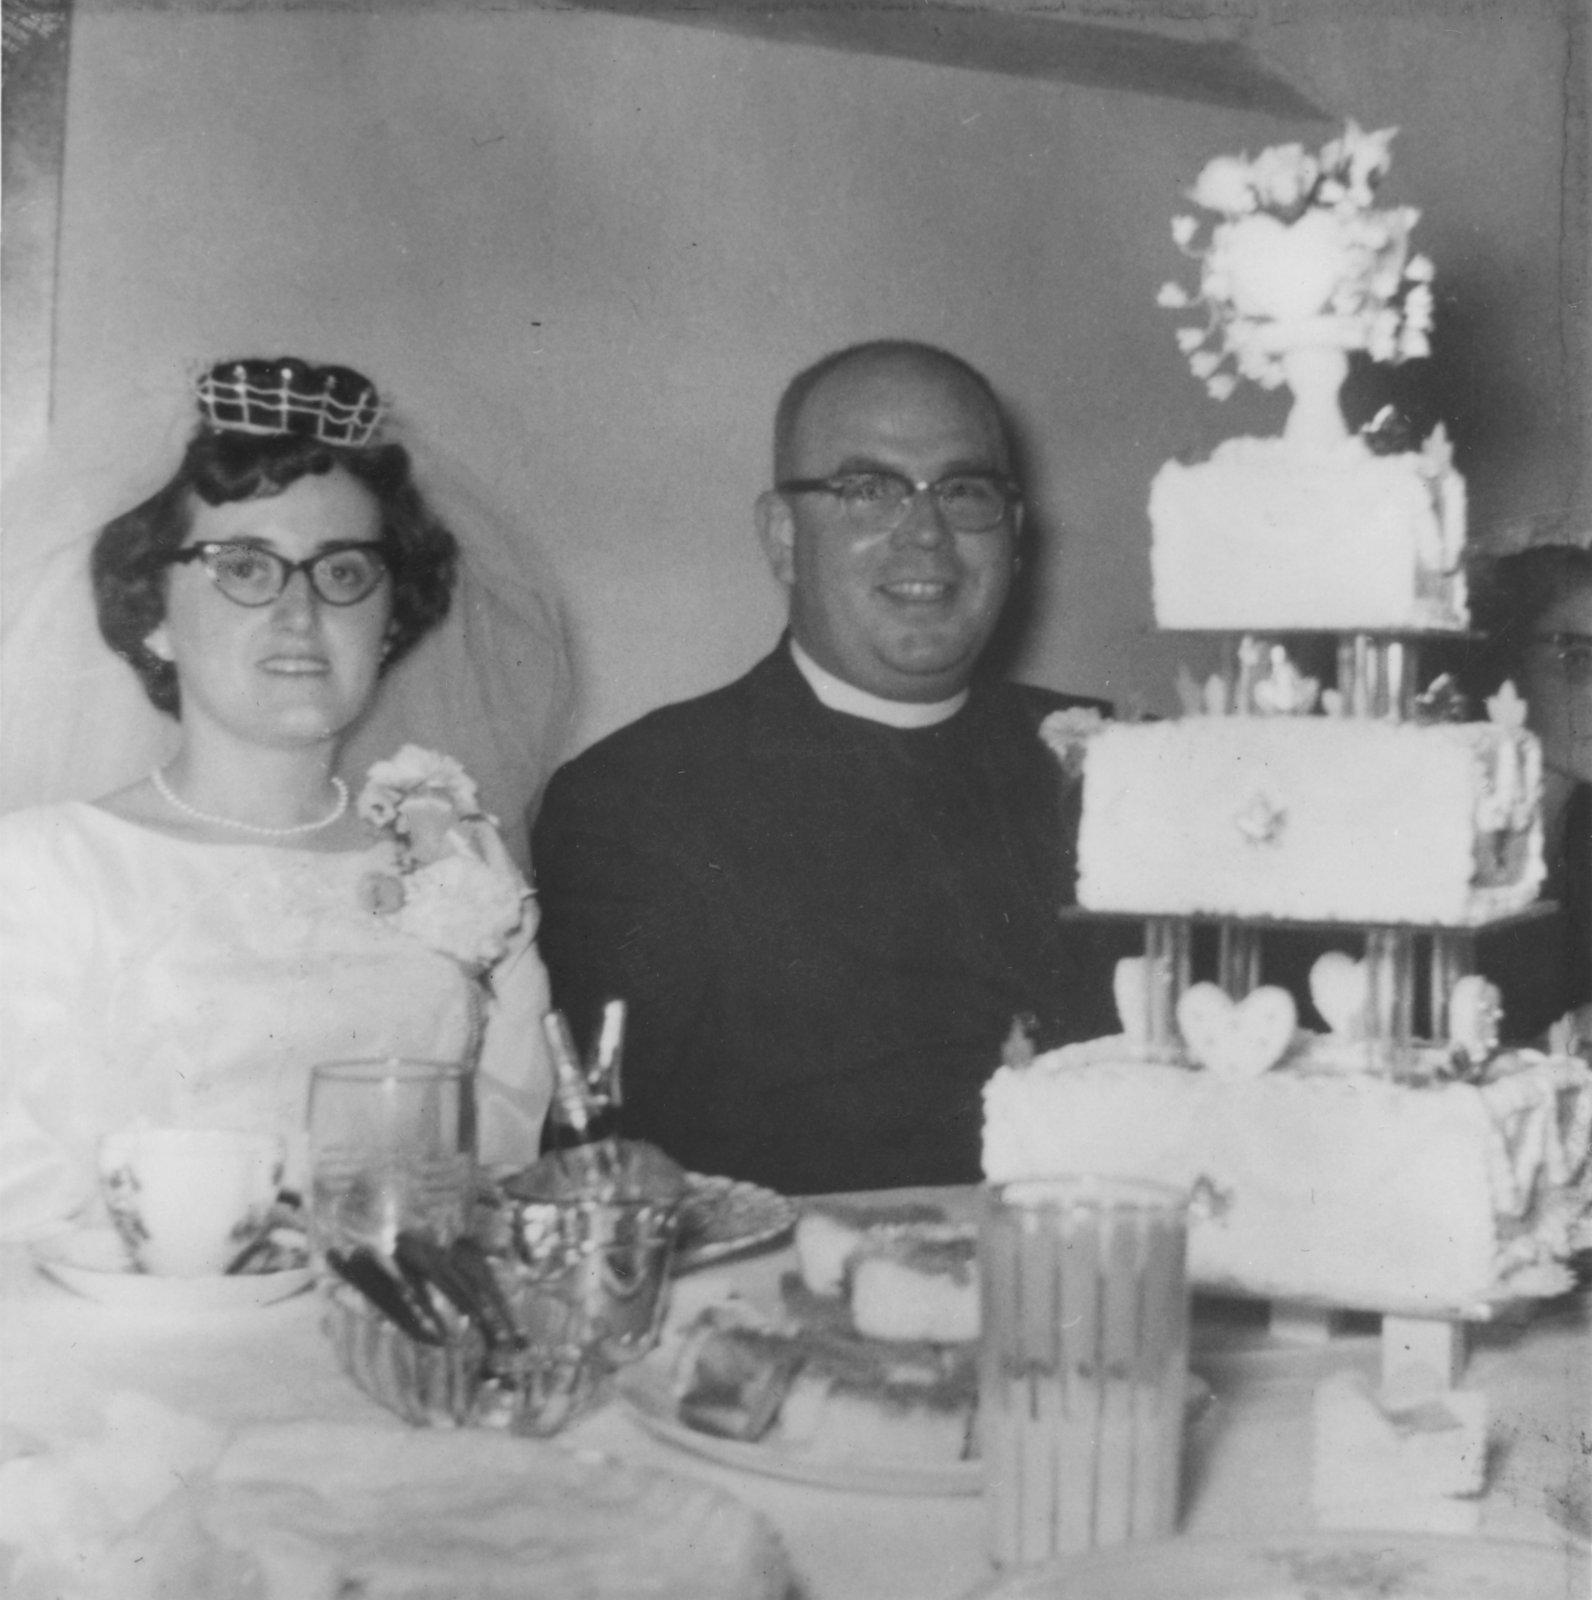 Wedding of Reverend Charles Dechert and Joyce Radke